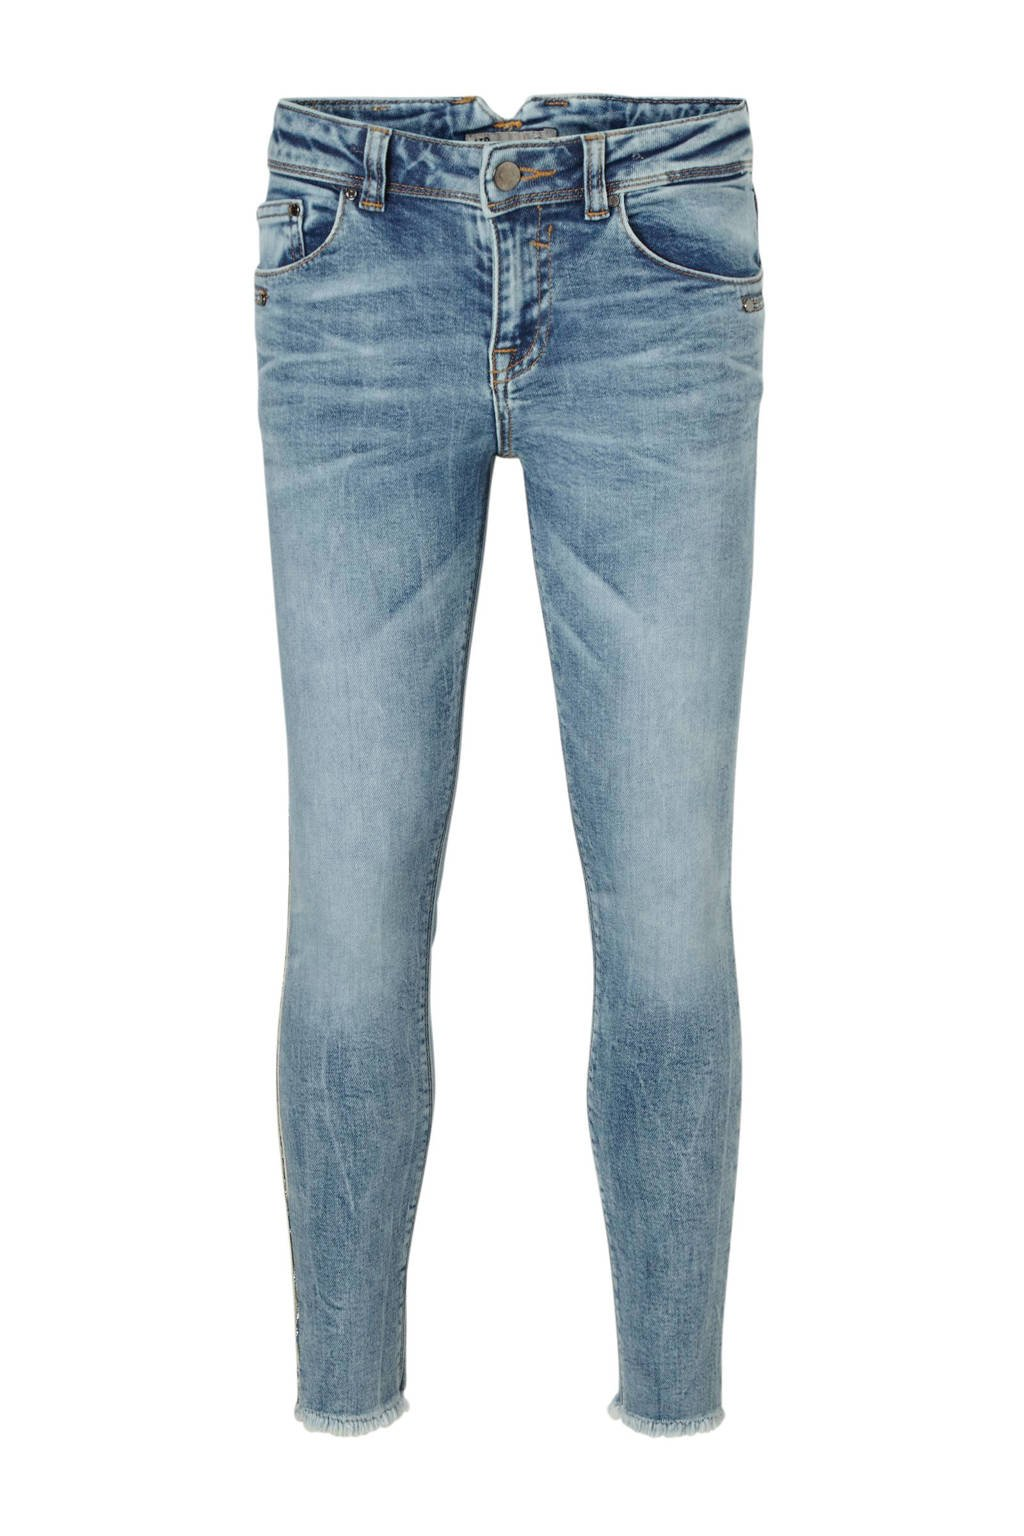 LTB skinny ankle fit jeans Georget met zijbies blauw, Blauw (Silver Myra wash)